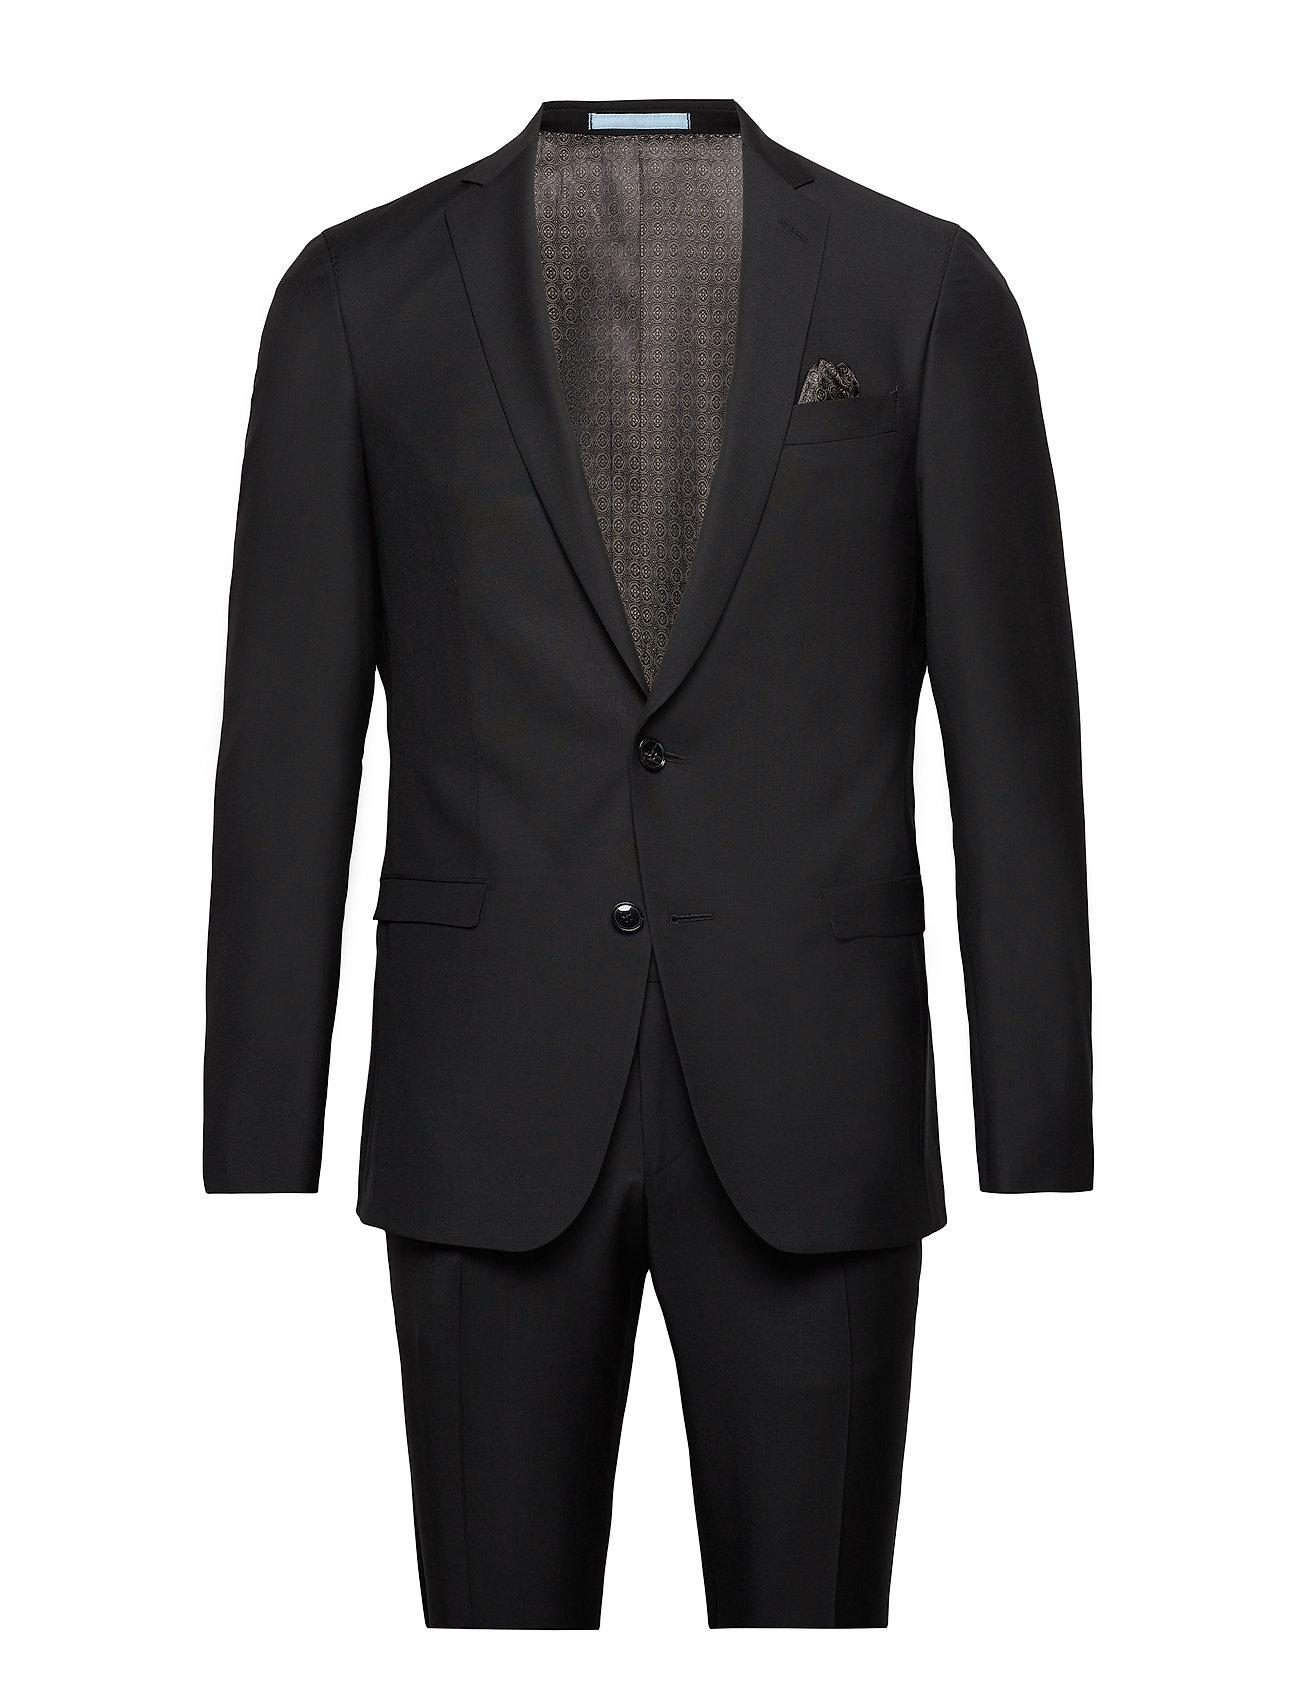 SAND Mohair 3 Star Craig Normal Kostymer & kavajer